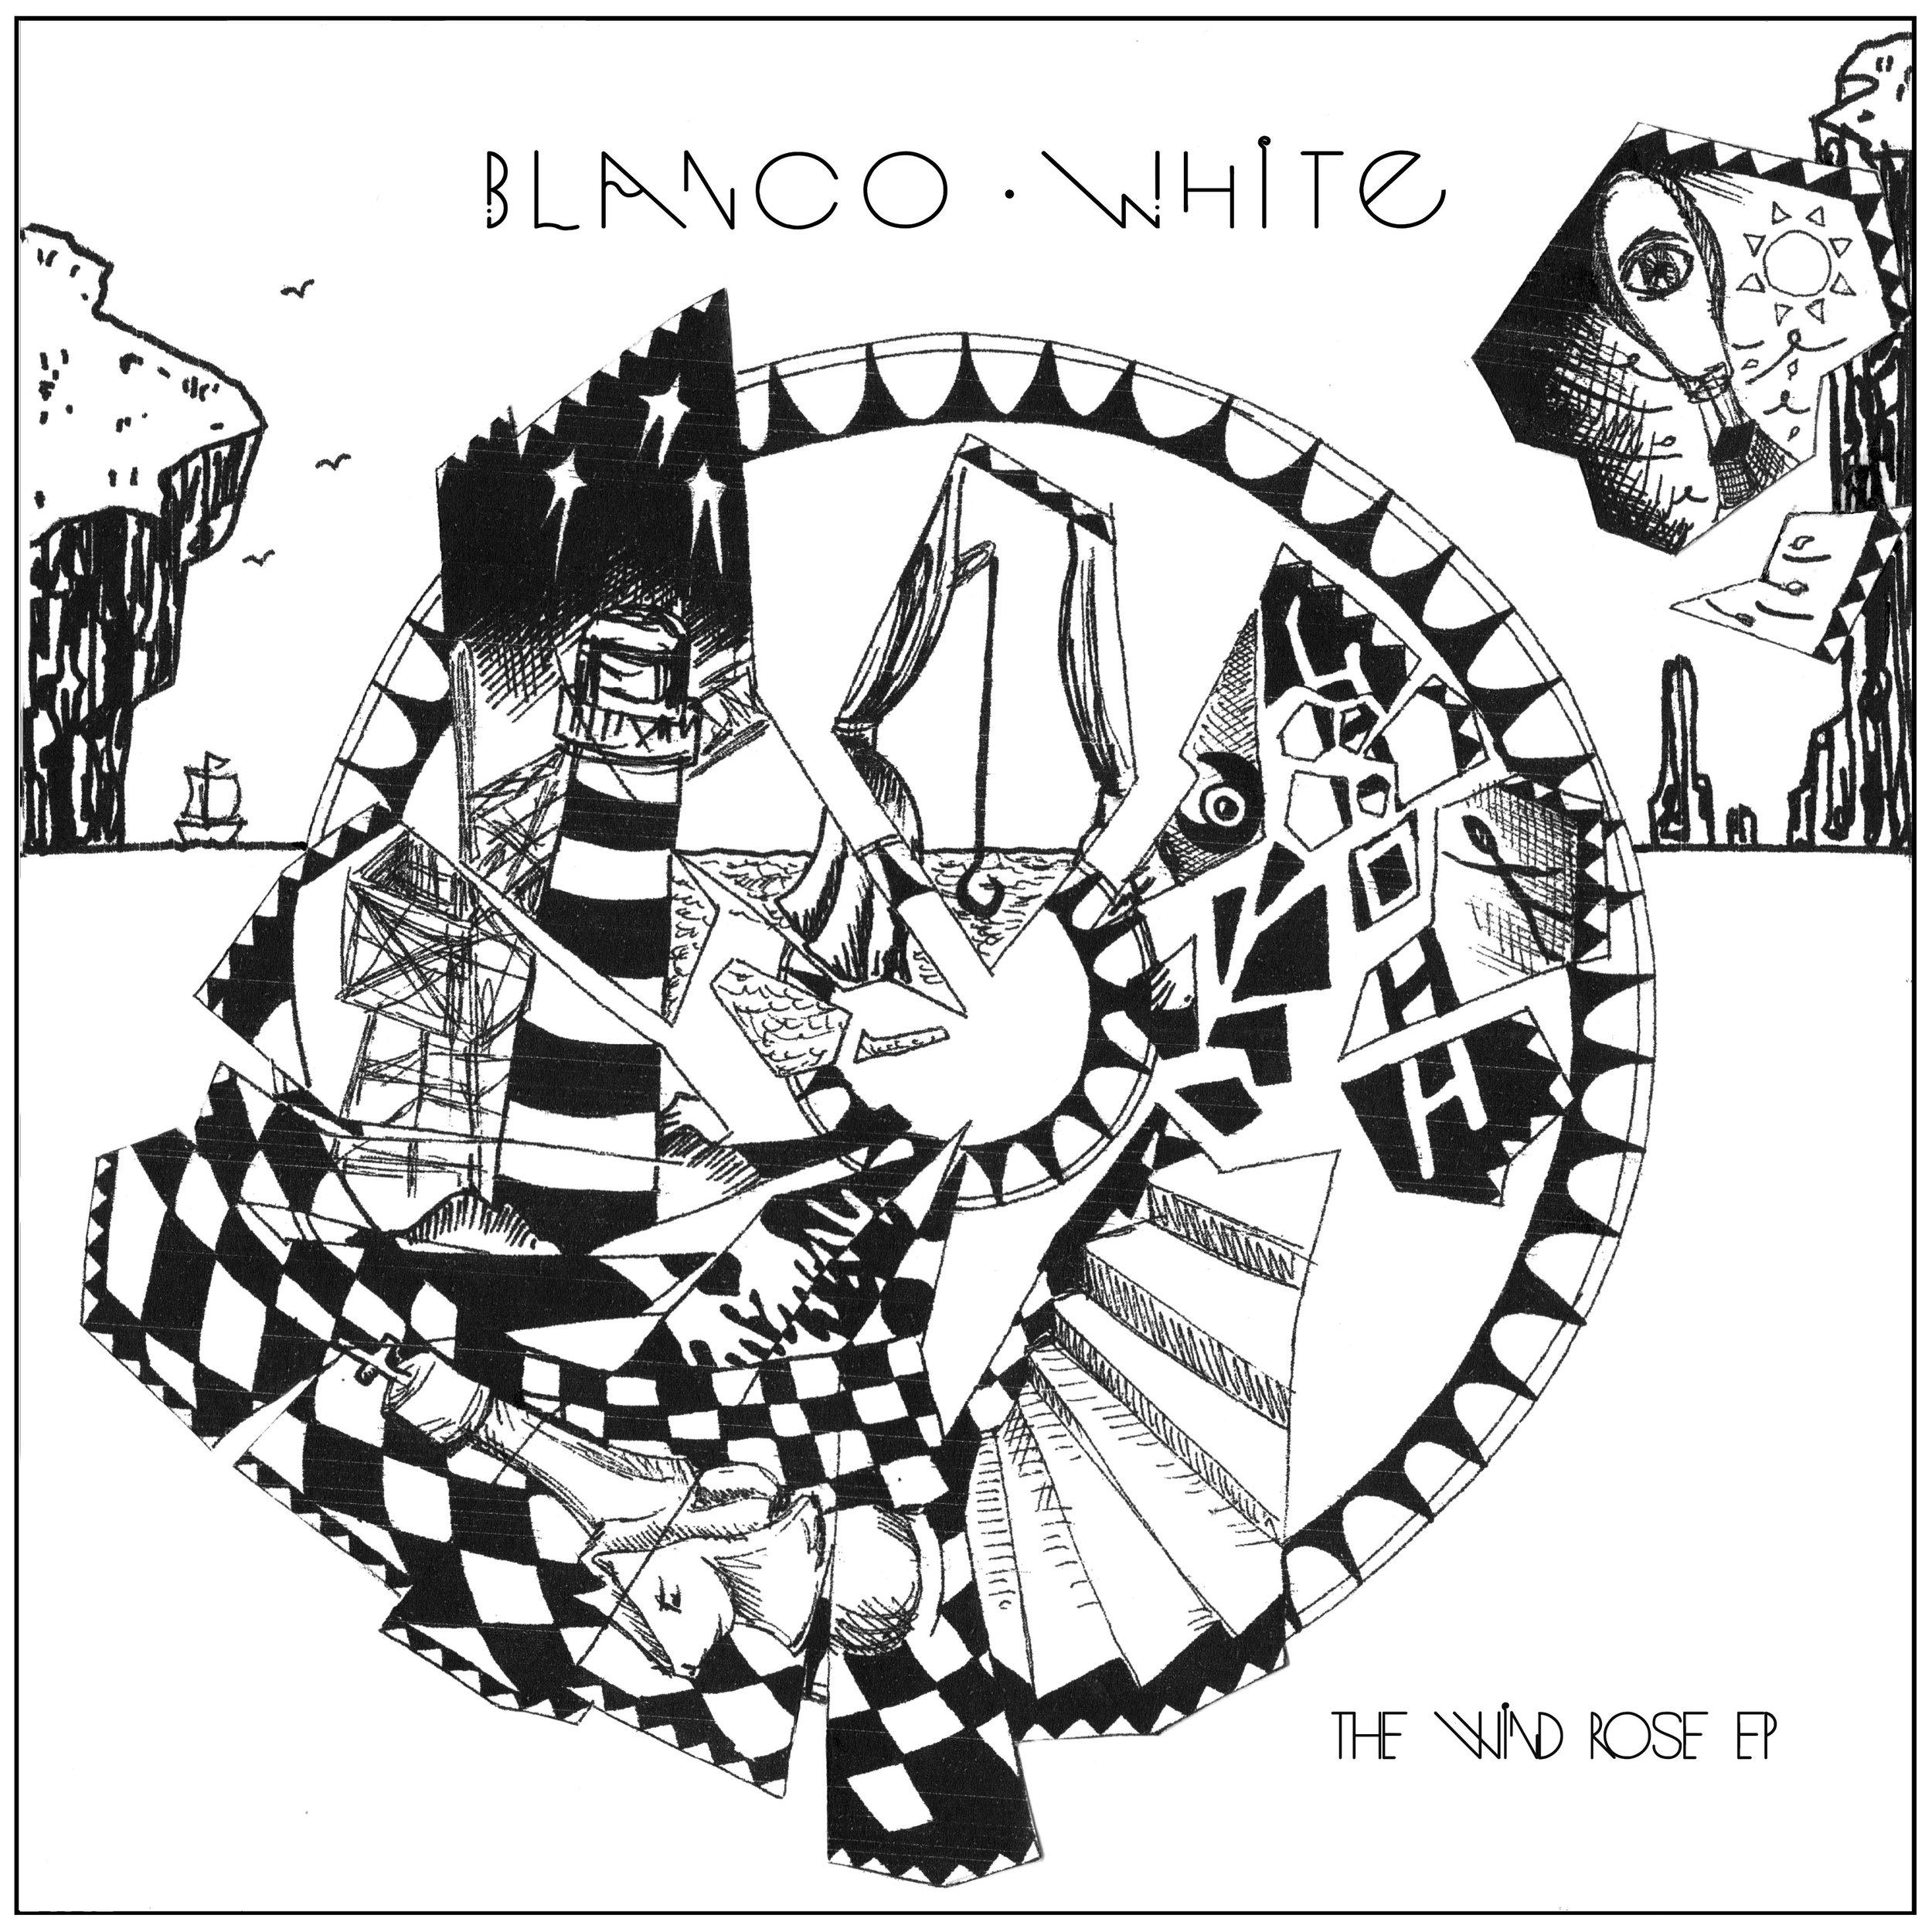 BLANCO WHITE -THE WIND ROSE